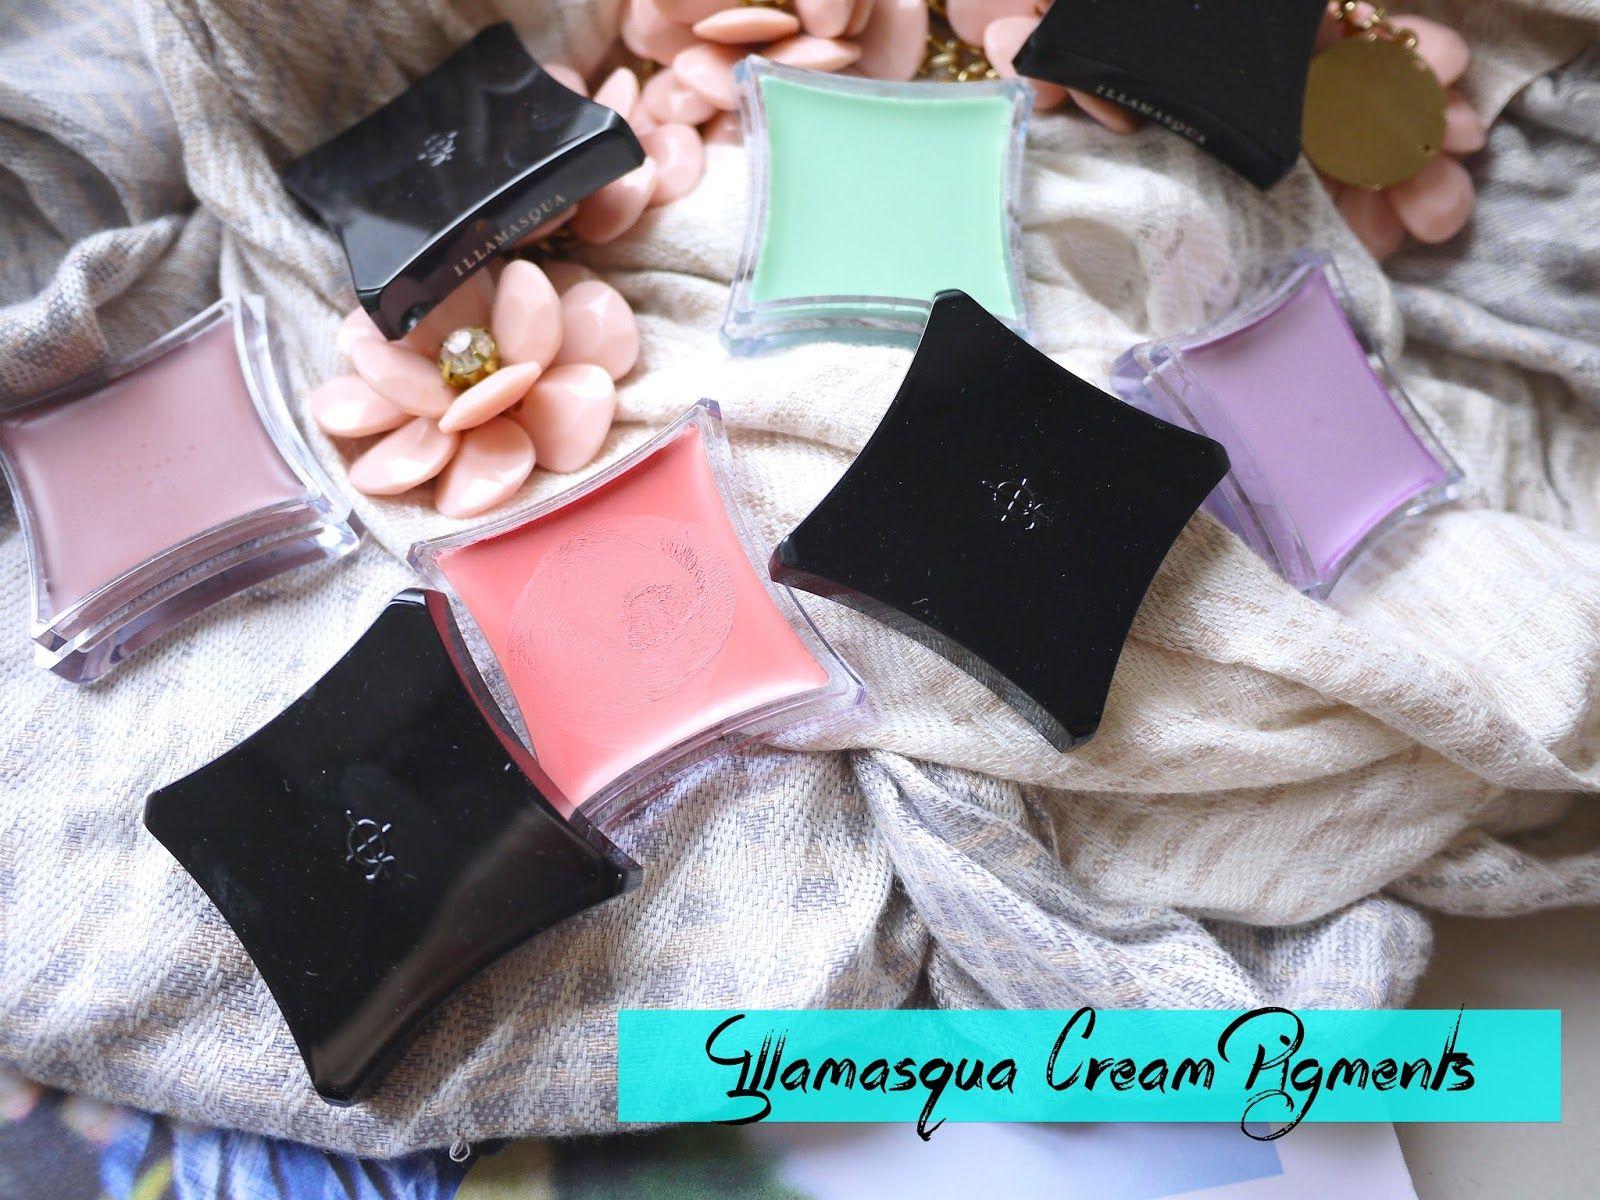 illamasqua cream pigments deliurm bedaub androgen dab